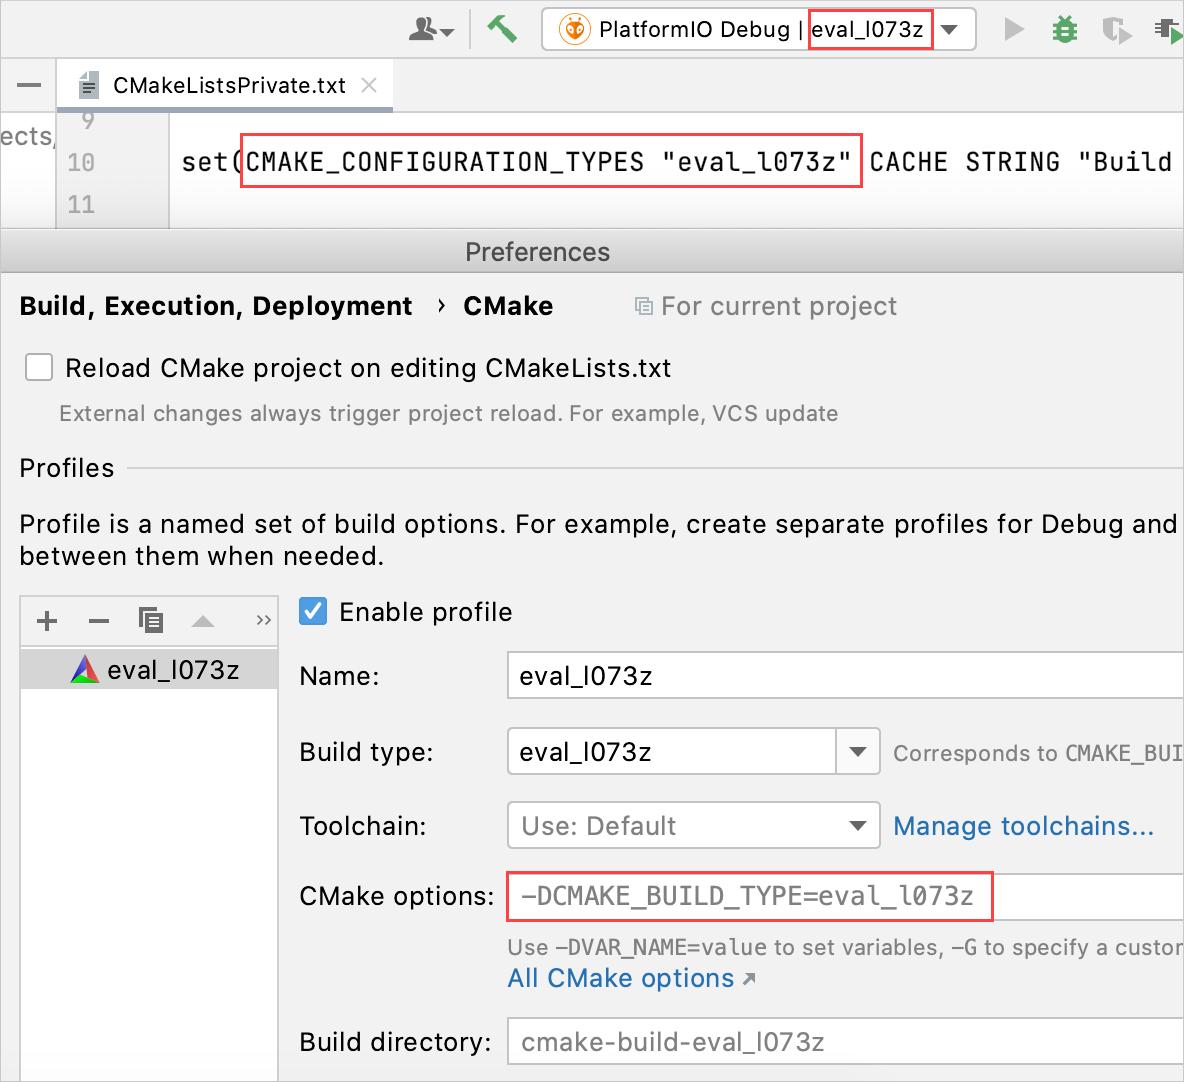 CMake profile for a PlatformIO project